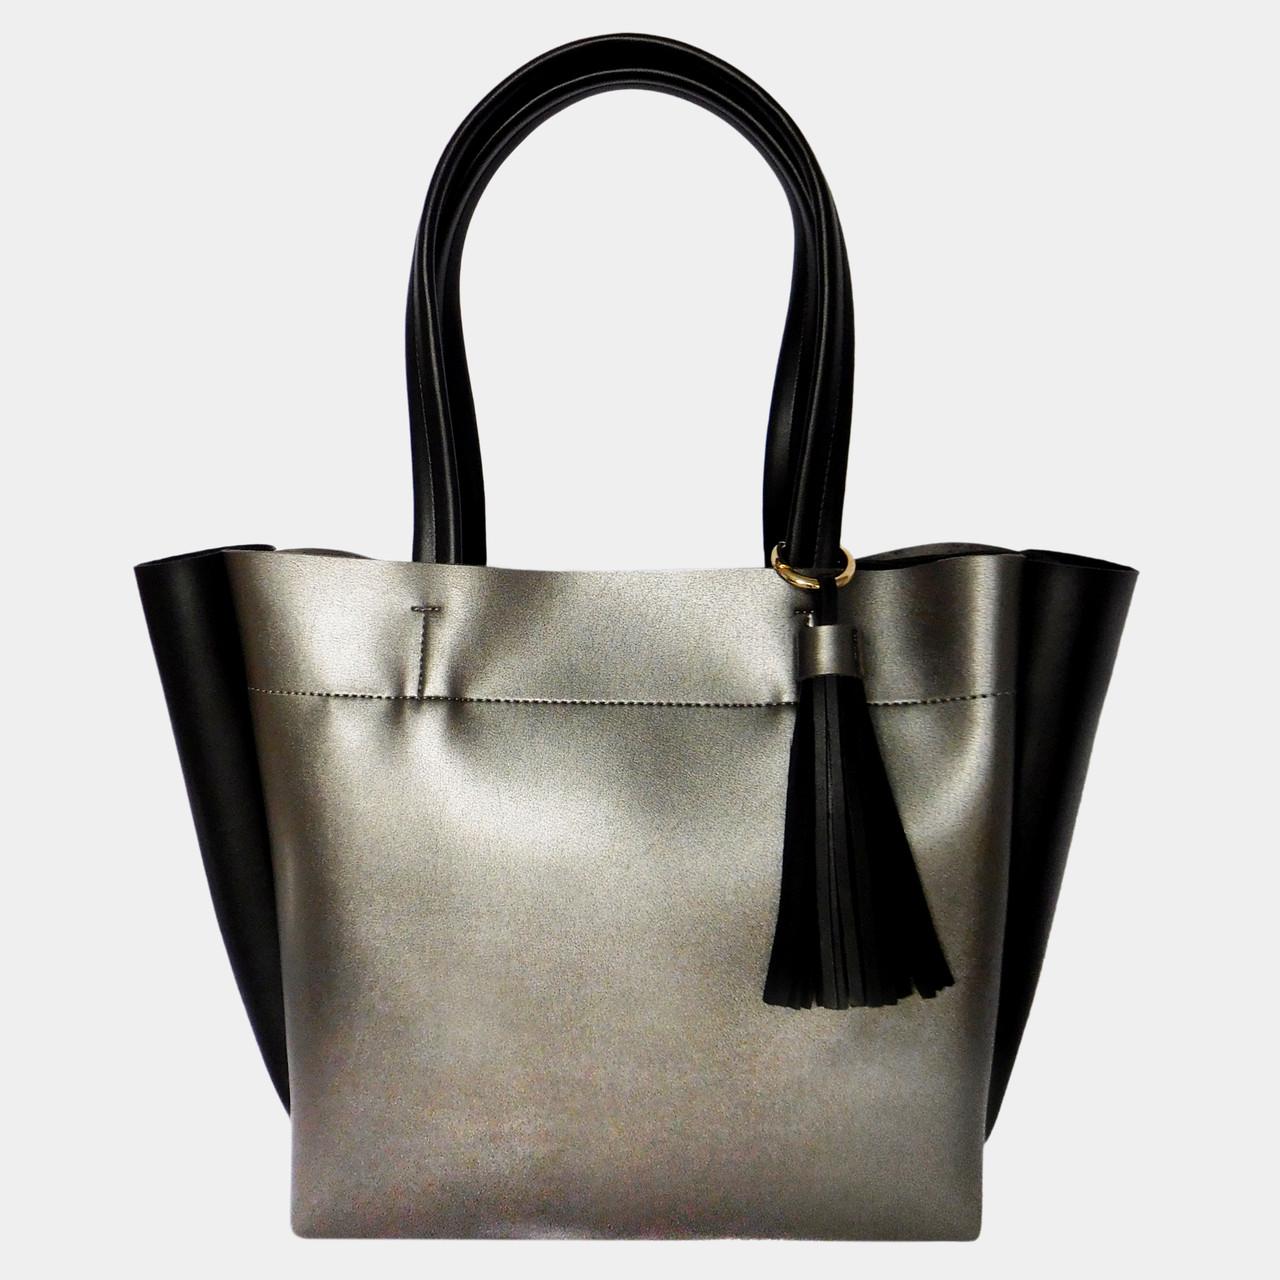 Сумка жіноча срібна з екошкіри (чорні вставки)   Сумка женская серебряная  из экокожи (черные вставки) 1c6a1e53d553f